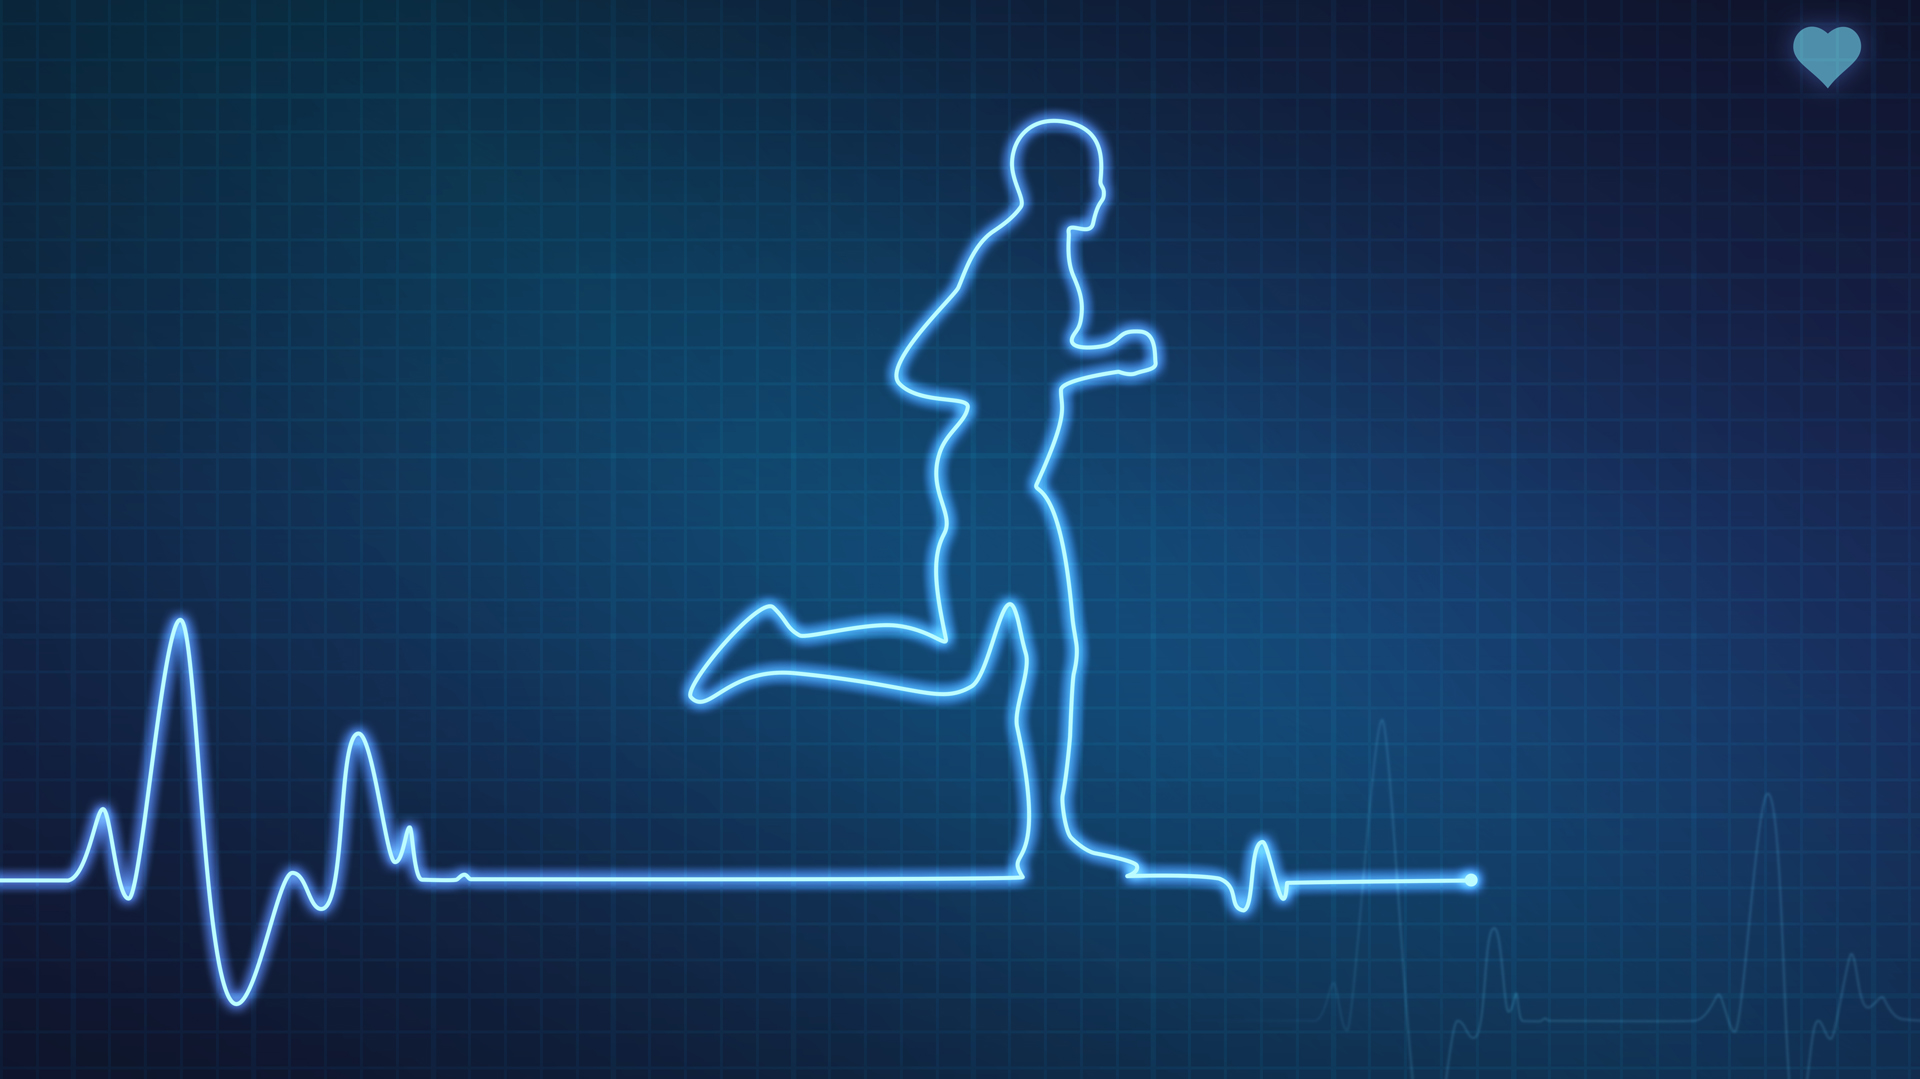 prueba de esfuerzo fisico en lima